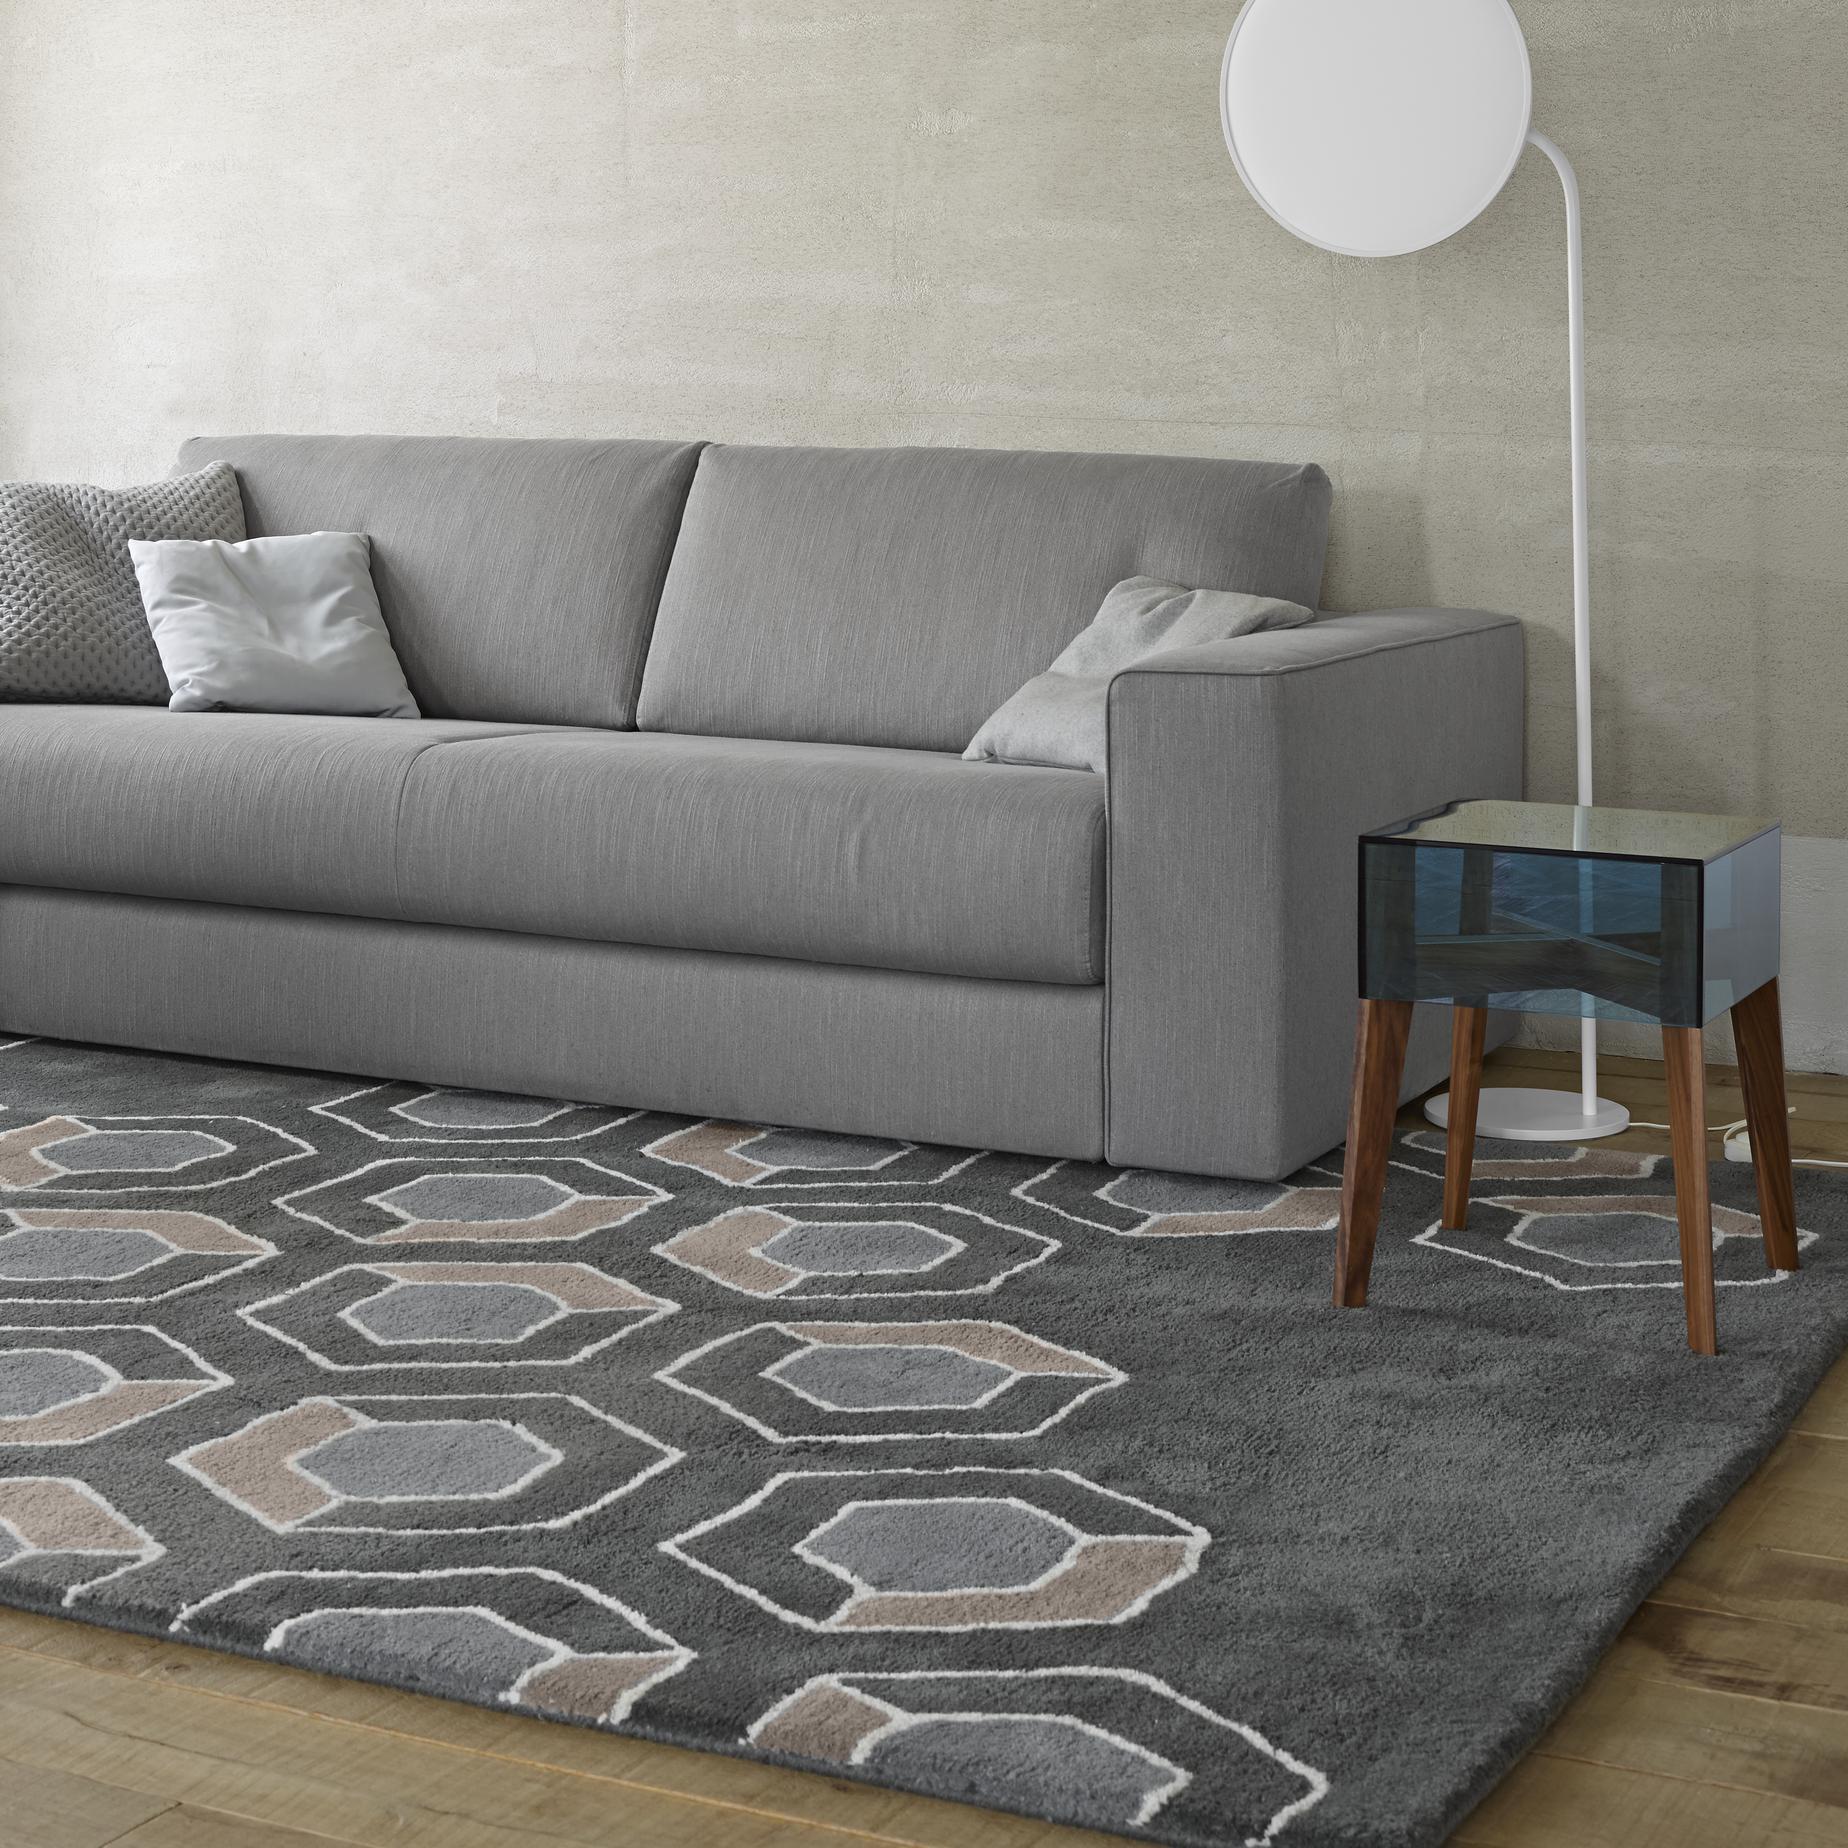 hix cloud tapis designer studio catoir ligne roset. Black Bedroom Furniture Sets. Home Design Ideas